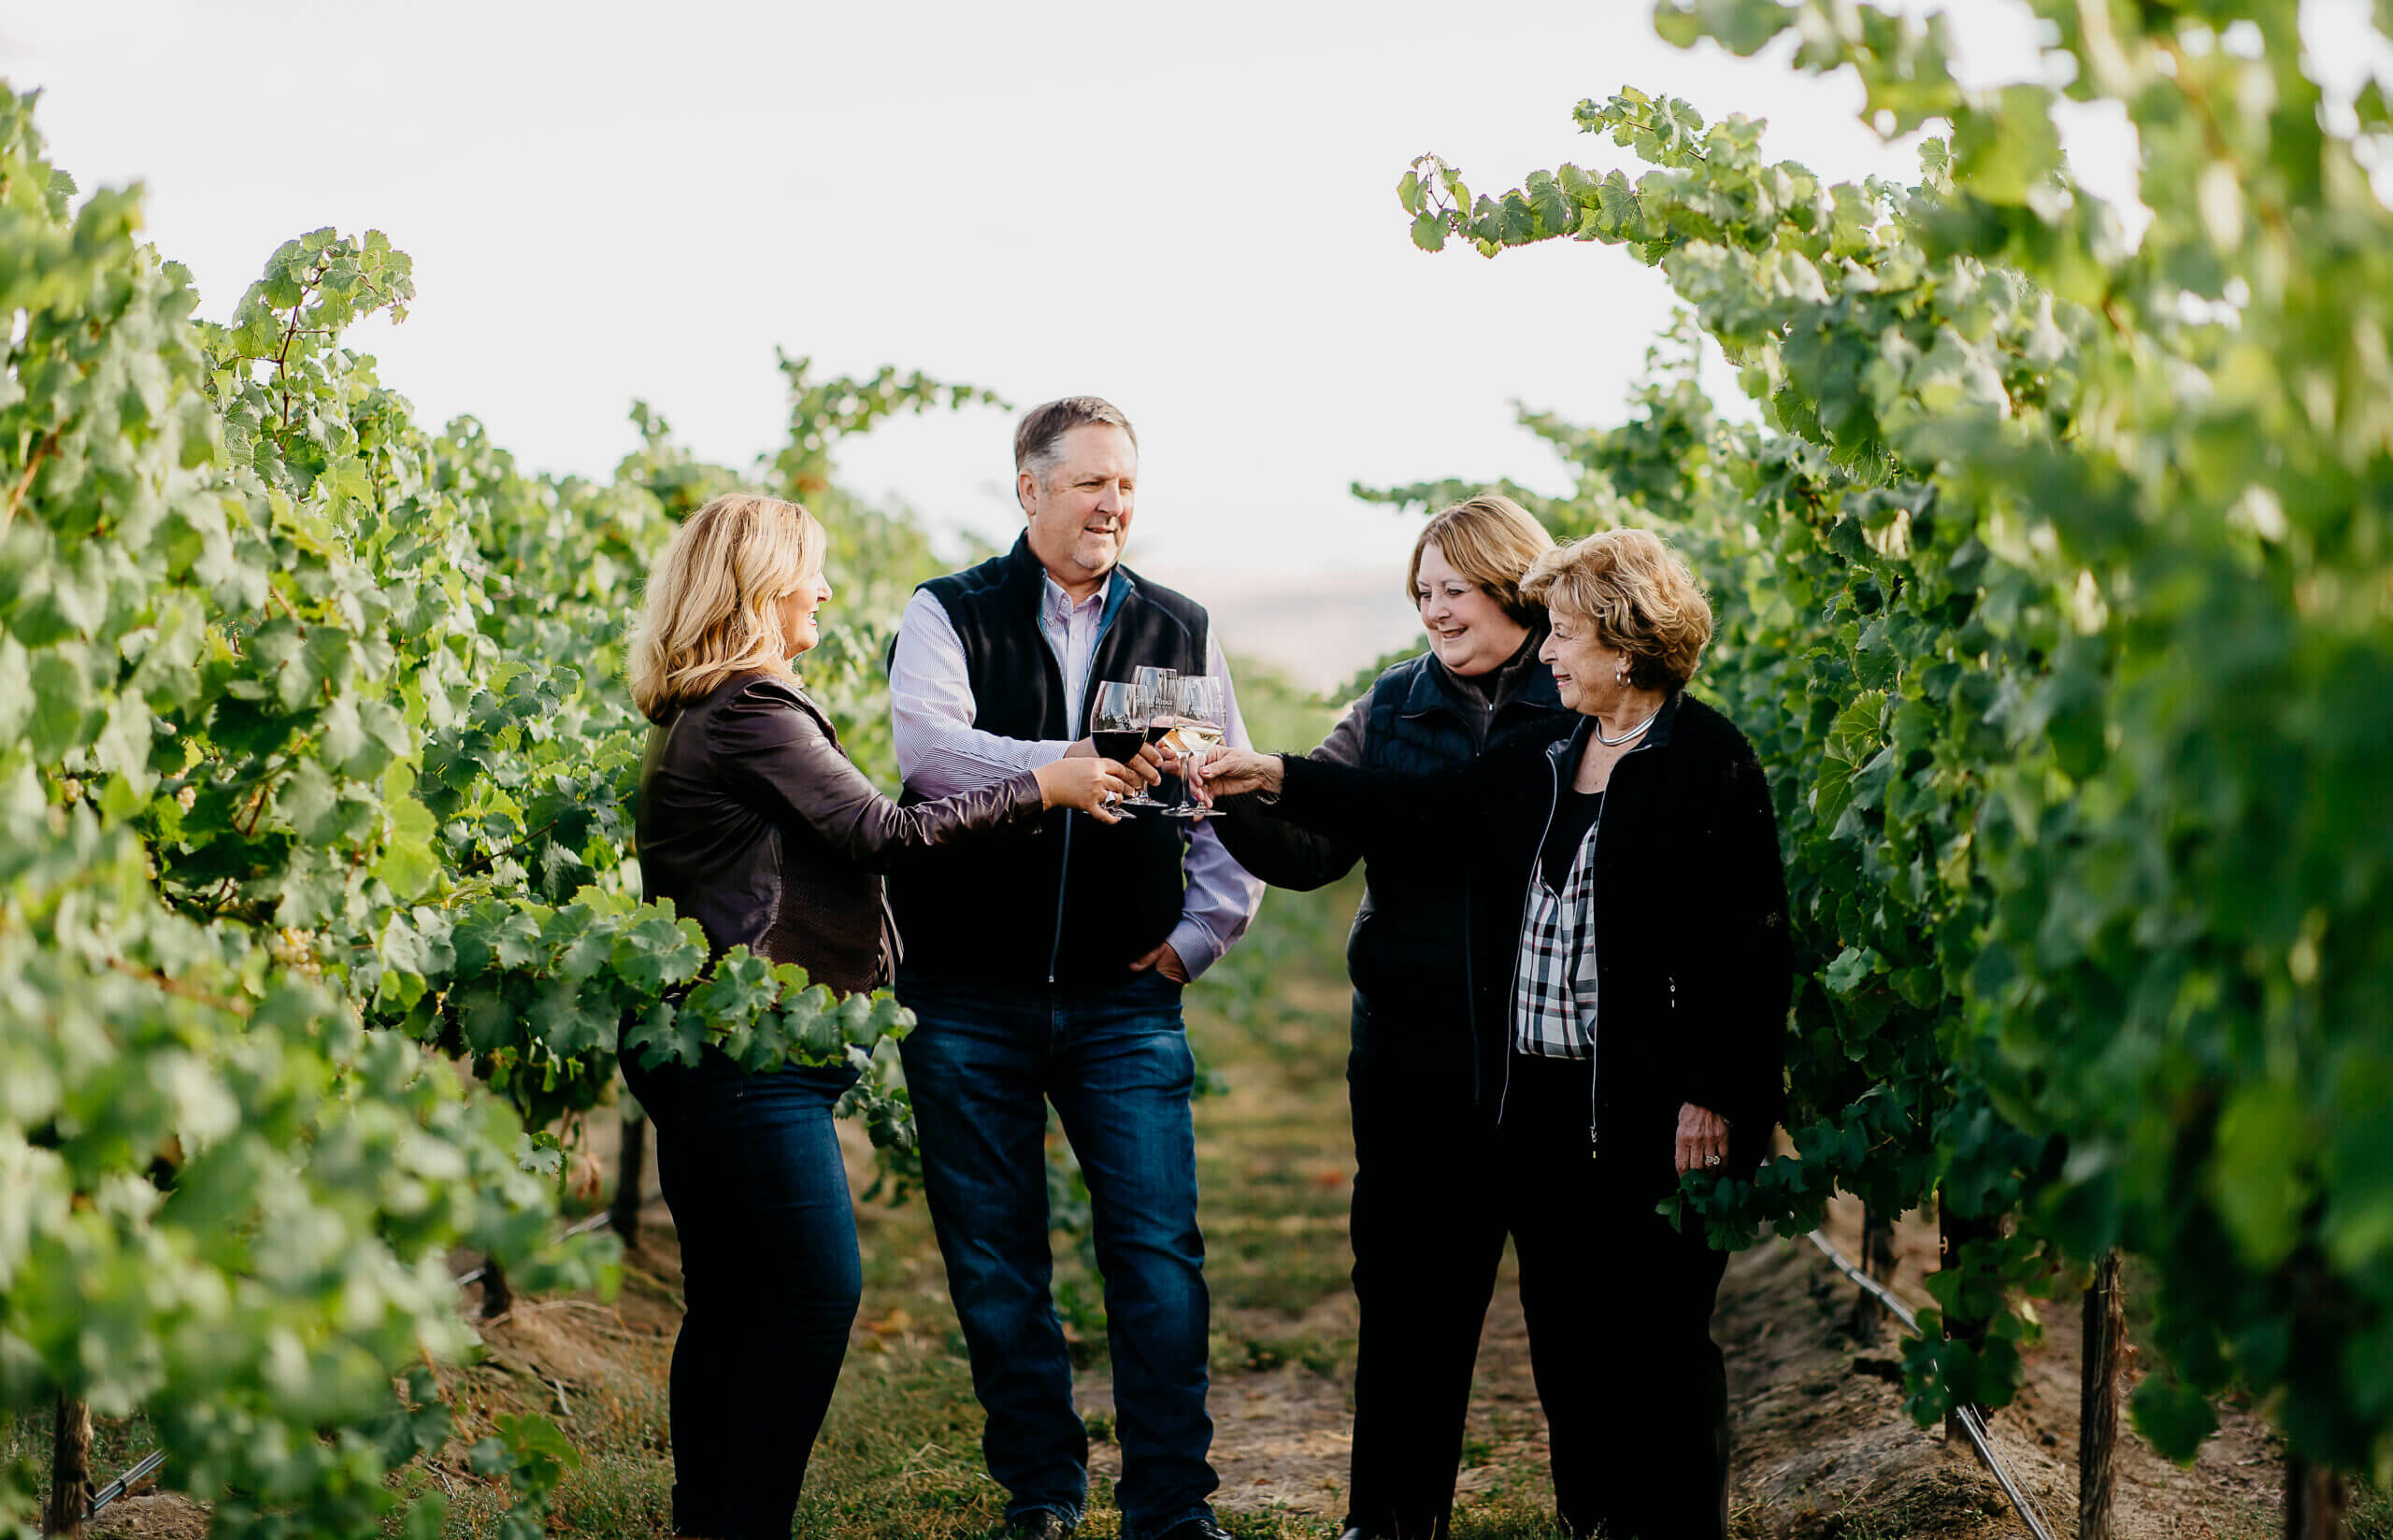 The Monson Family in the vineyards